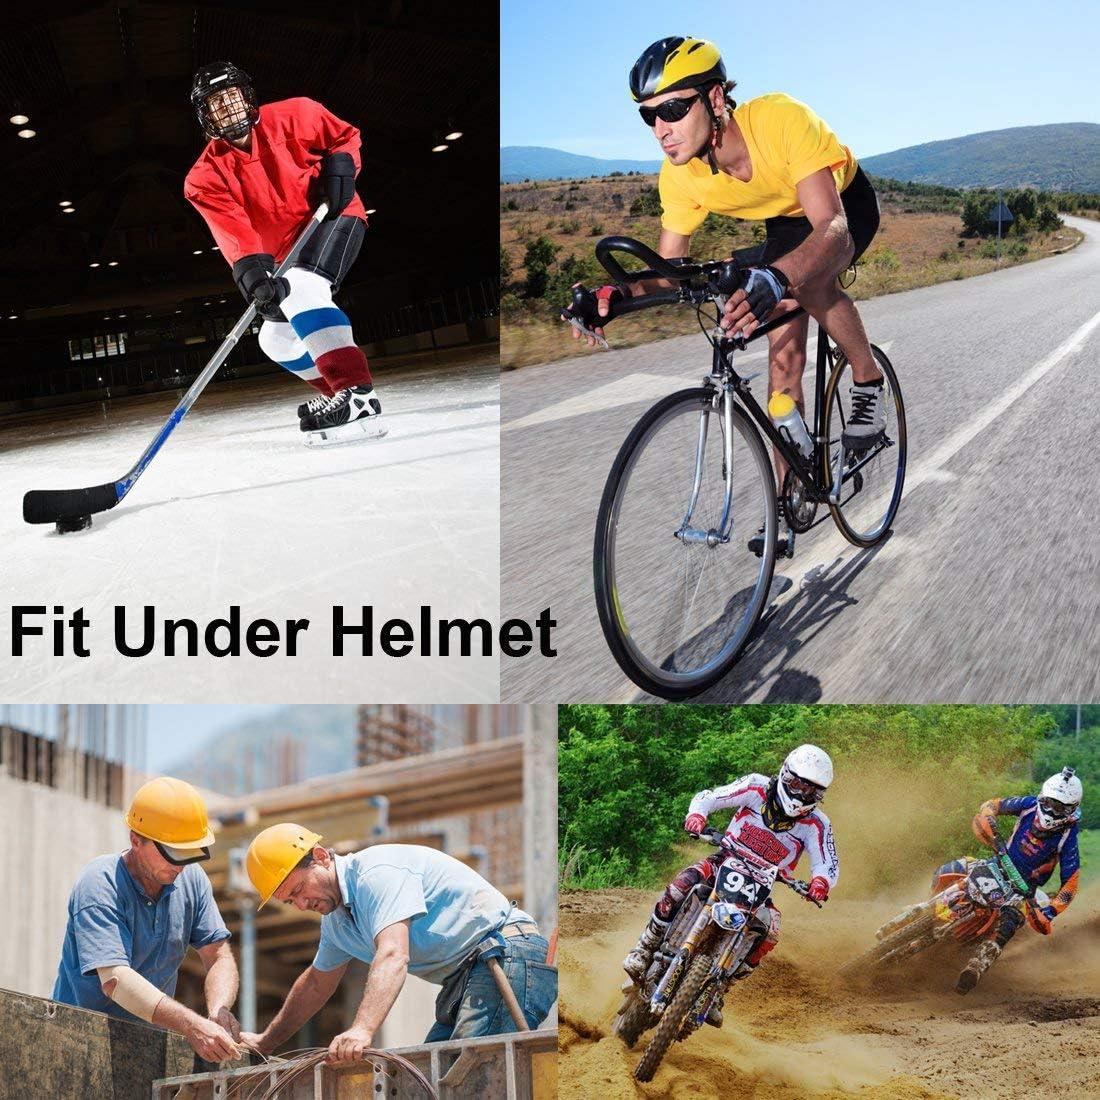 Wisolt Sweat-Wicking Beanie Cap 3 Pack Sweat Wicking Beanie Cap Chapeau Sports Headwear Cyclisme Moto Equitation Respirant Bandana Hat pour Hommes et Femmes